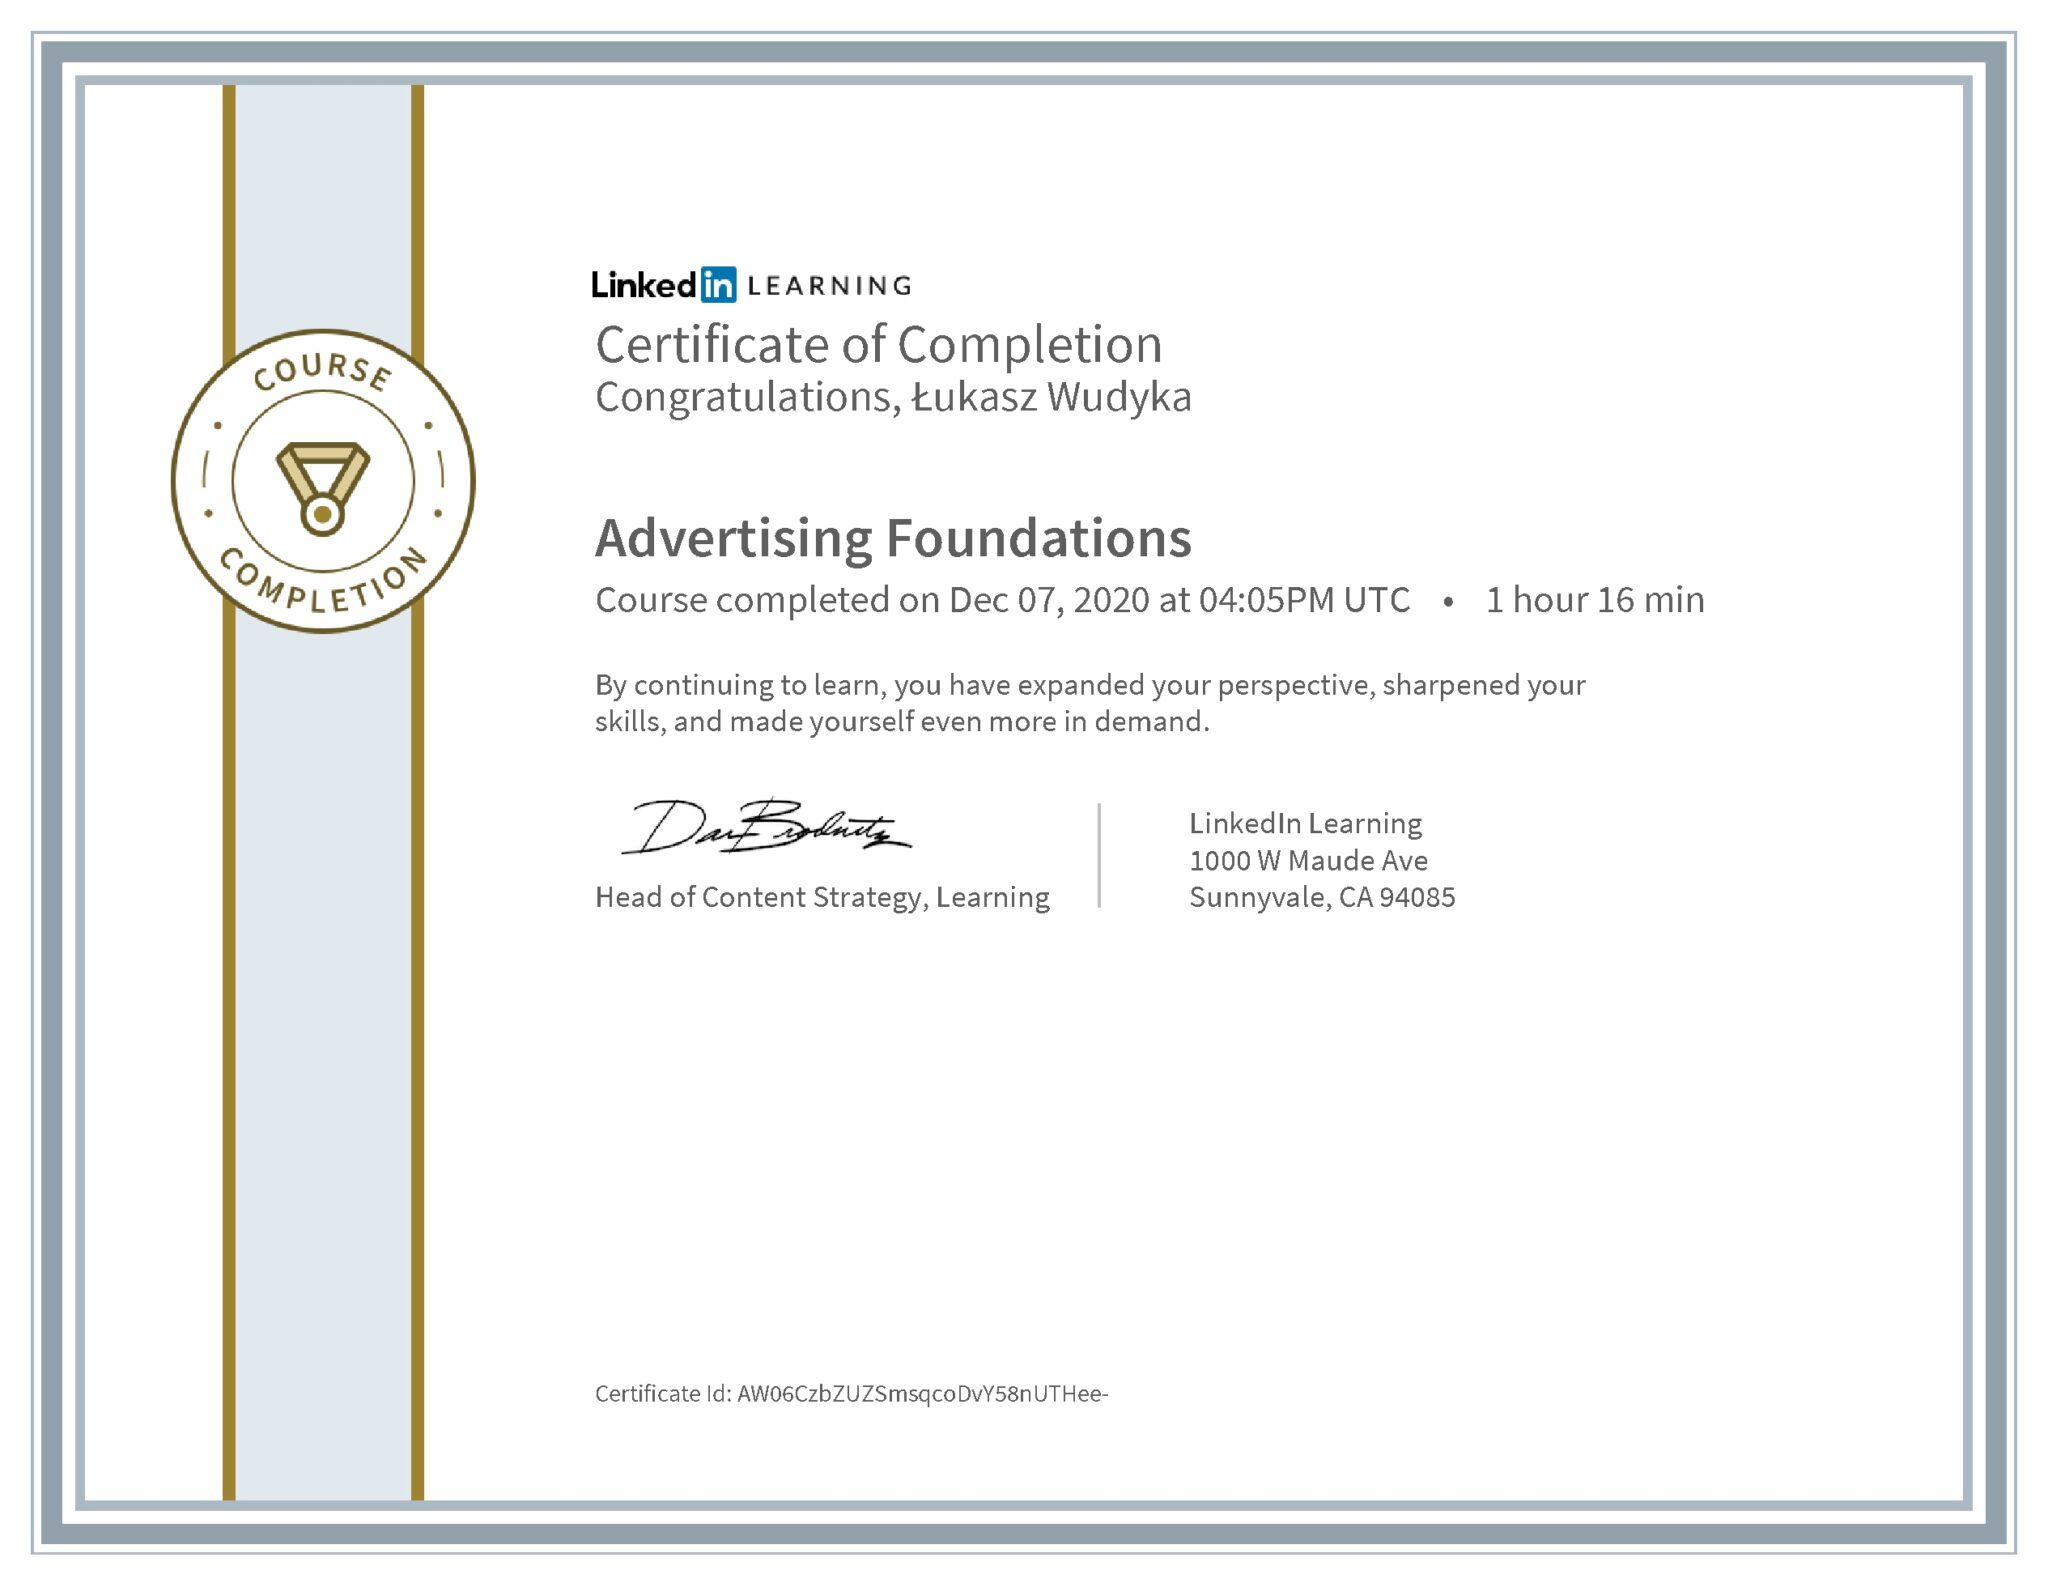 Łukasz Wudyka certyfikat LinkedIn Advertising Foundations